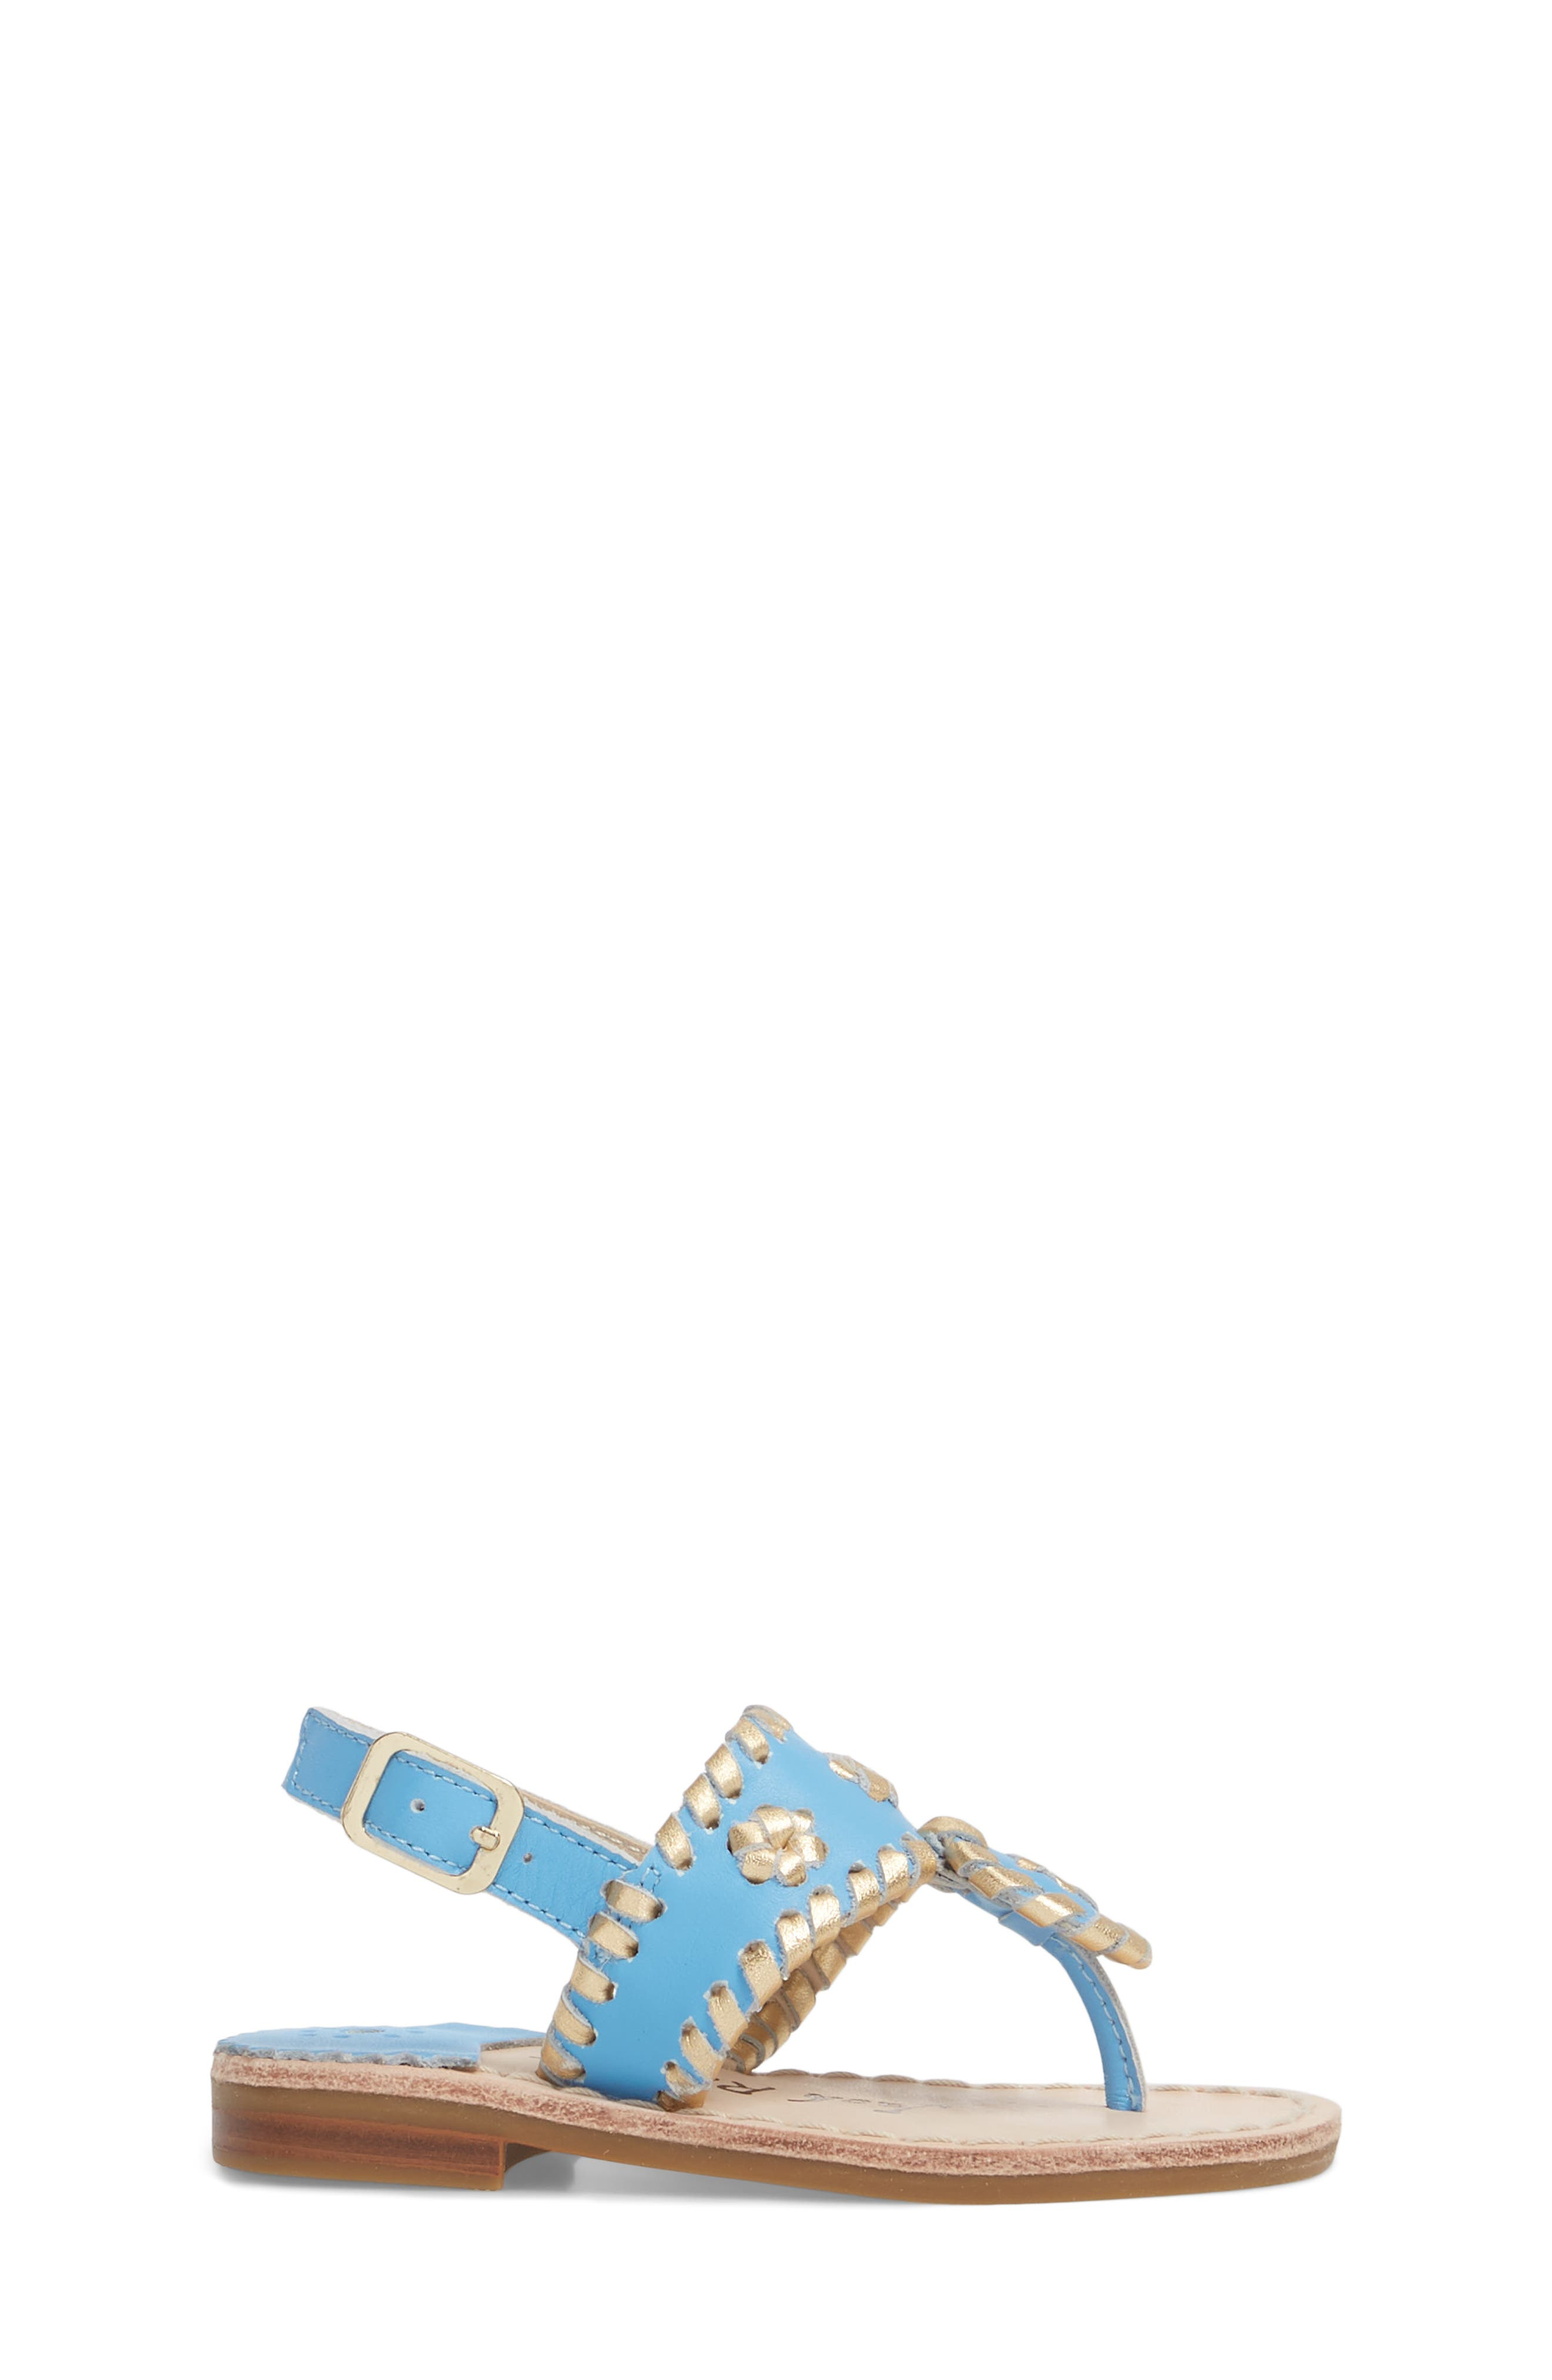 Little Miss Hollis Metallic Trim Sandal,                             Alternate thumbnail 3, color,                             FRENCH BLUE/ GOLD LEATHER